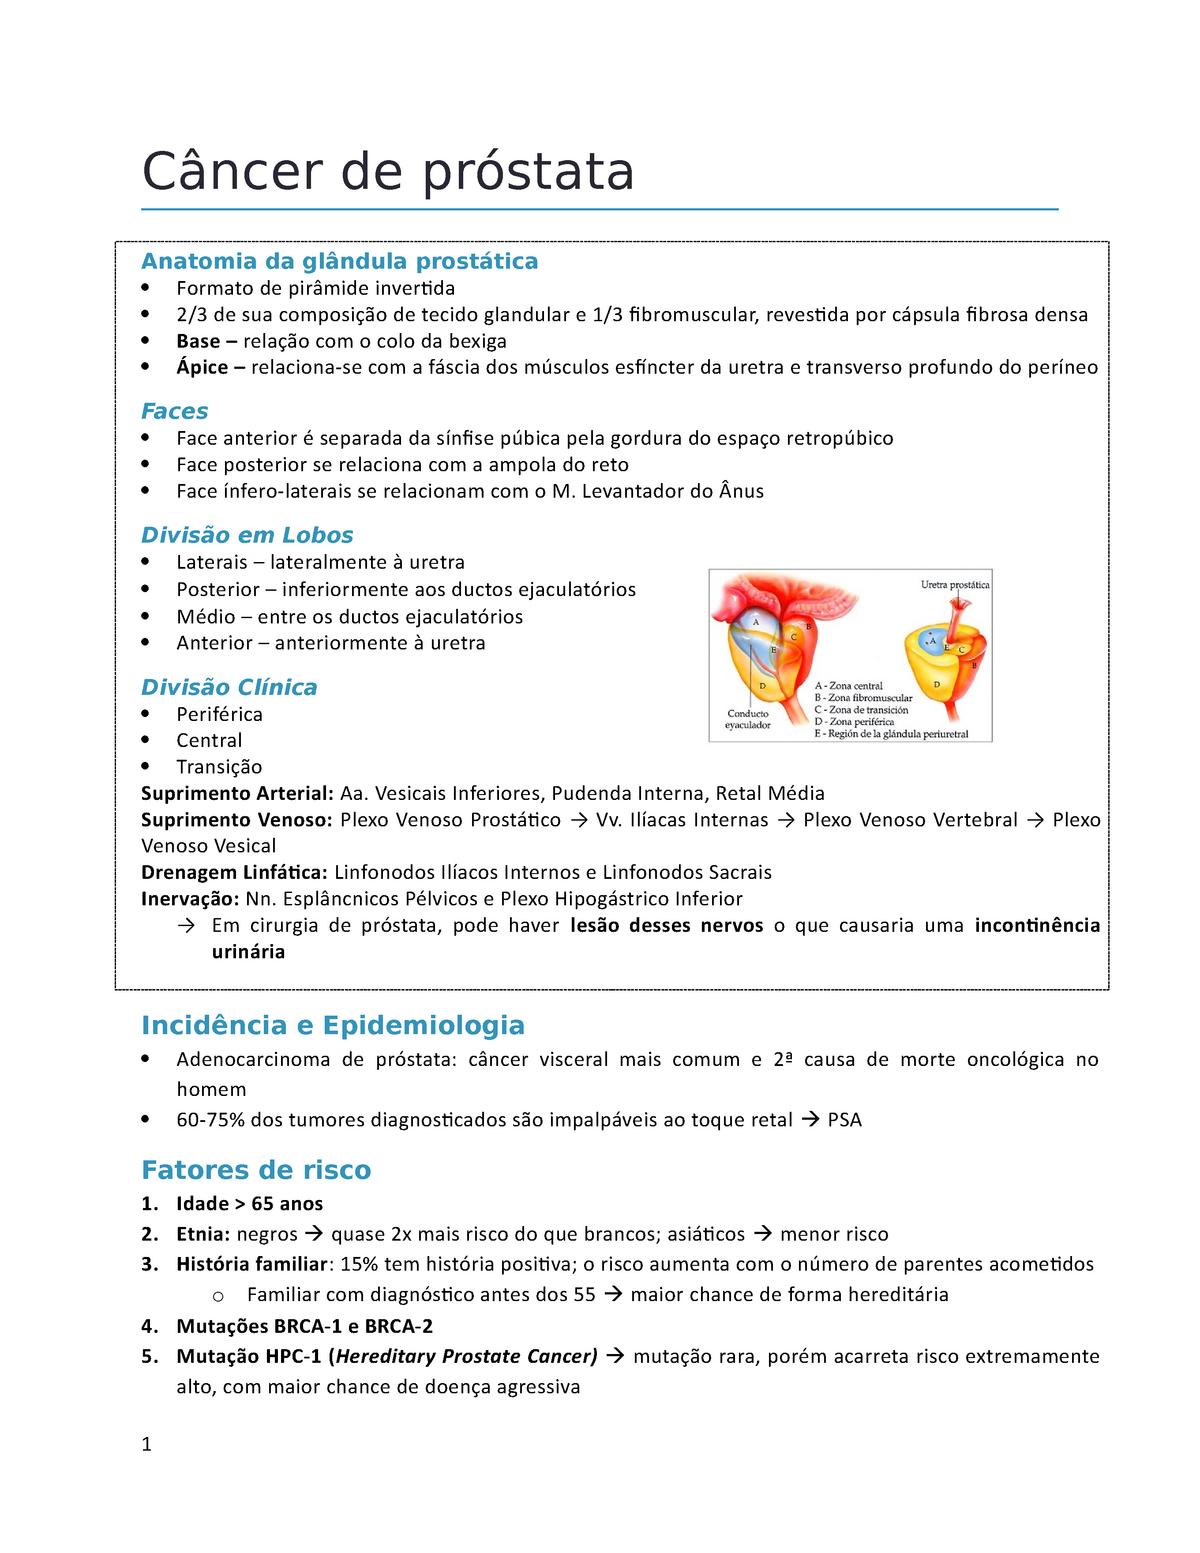 cancer de prostata t3